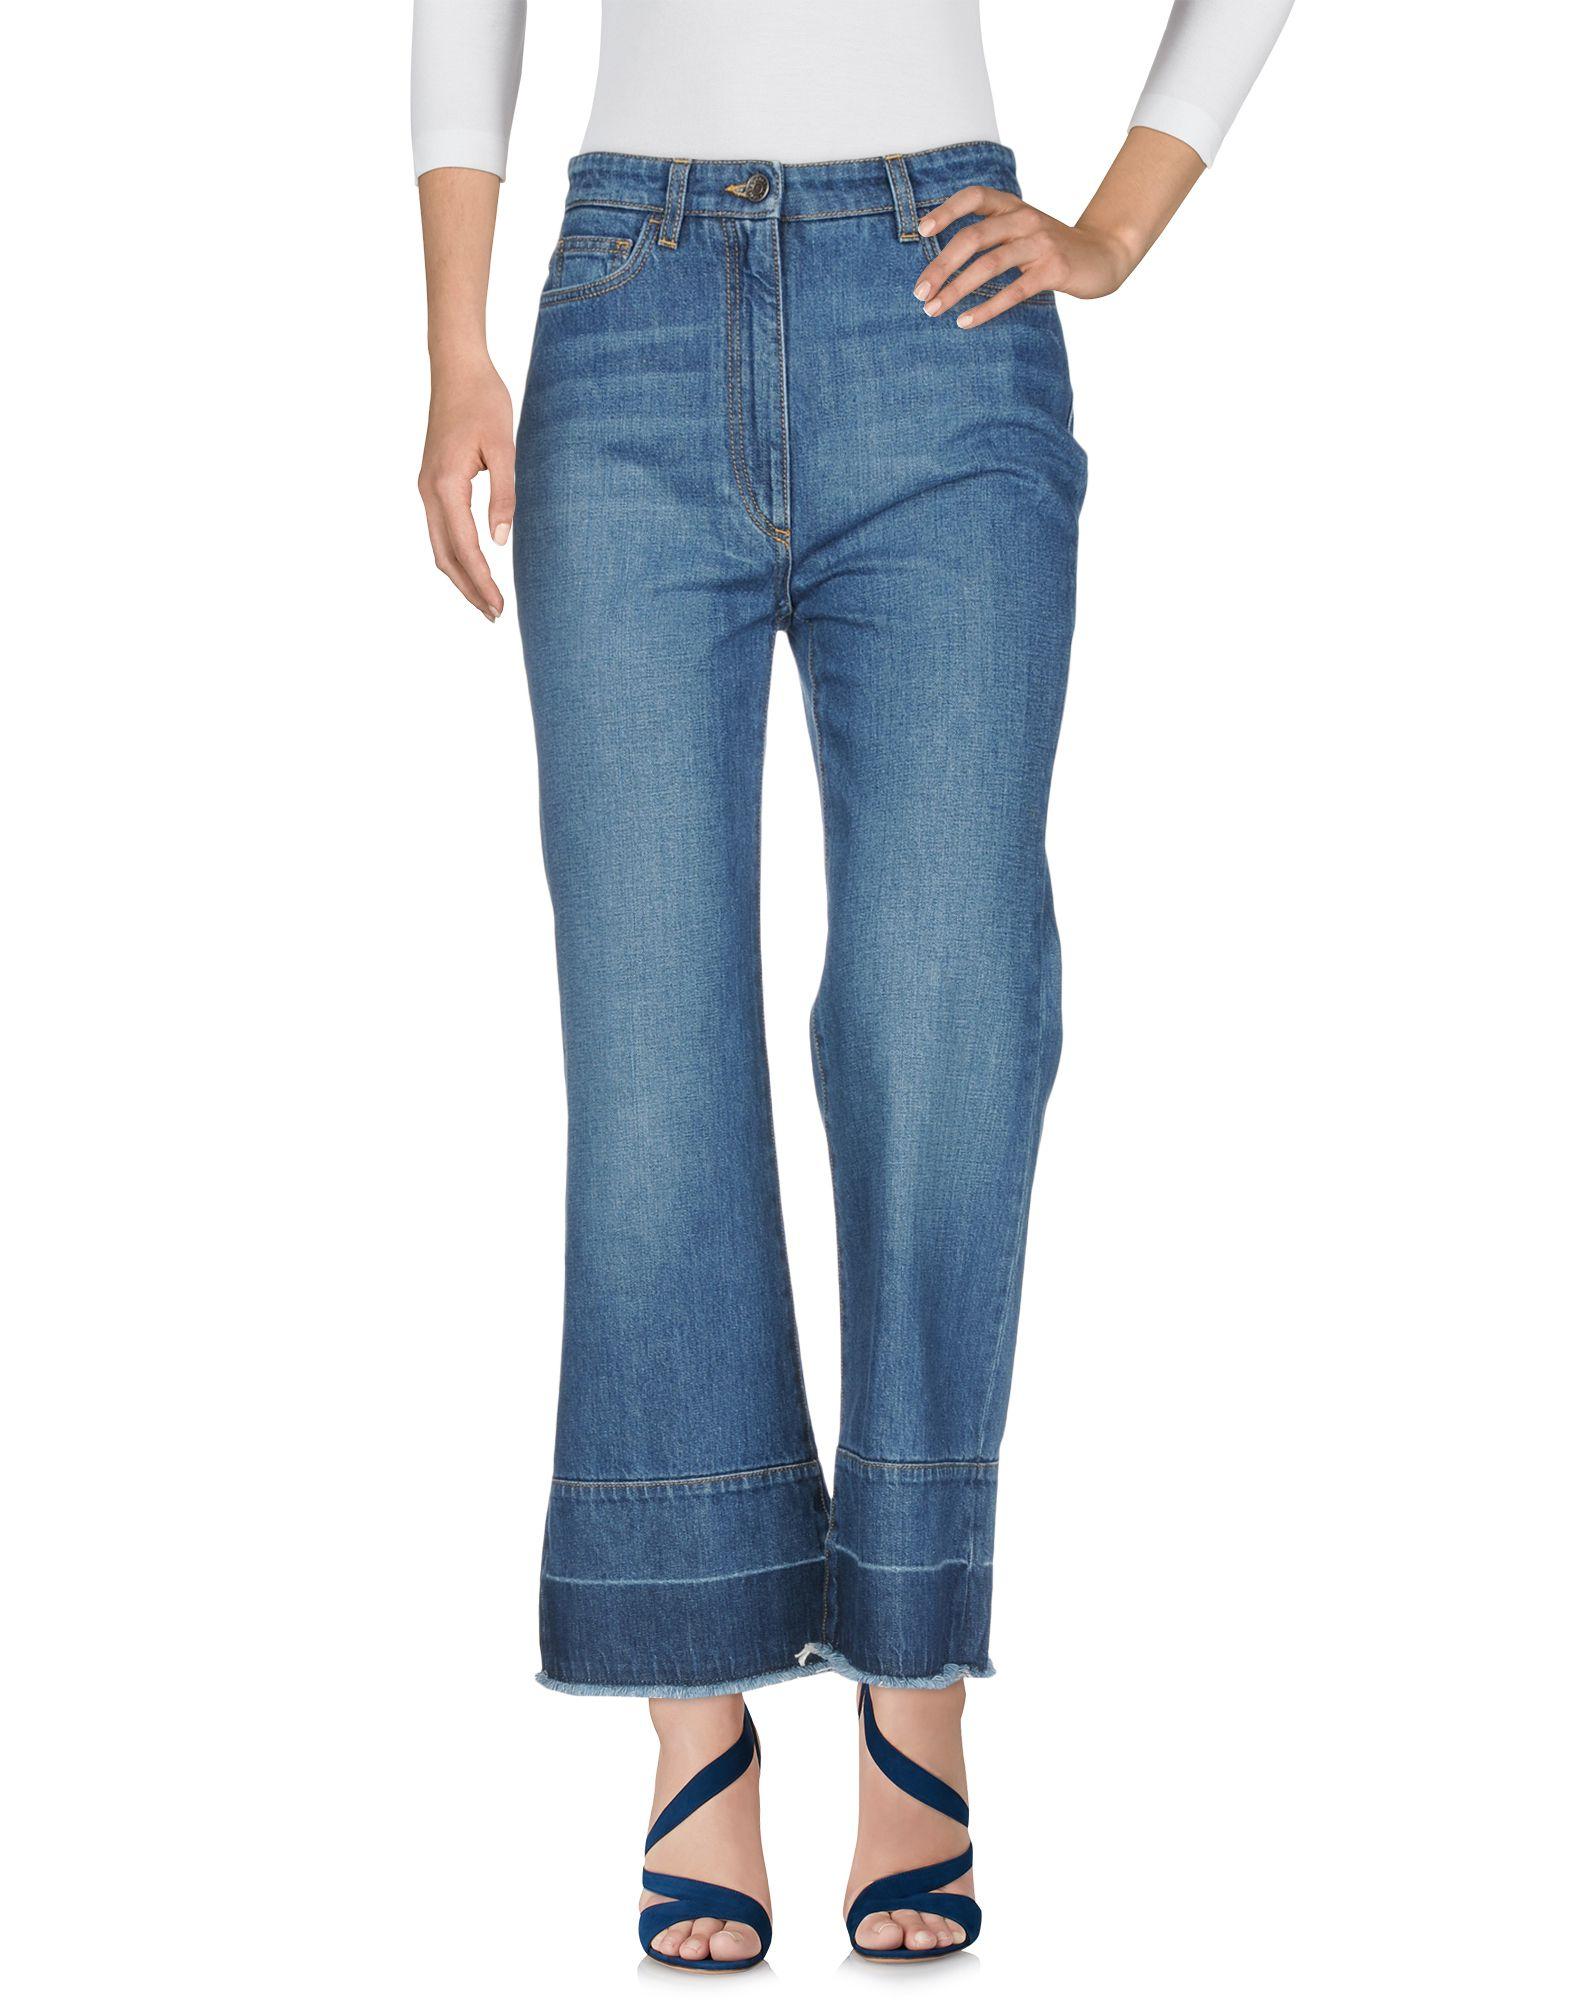 Pantaloni Jeans Dolce & Gabbana Donna - Acquista online su 2rEi0IM